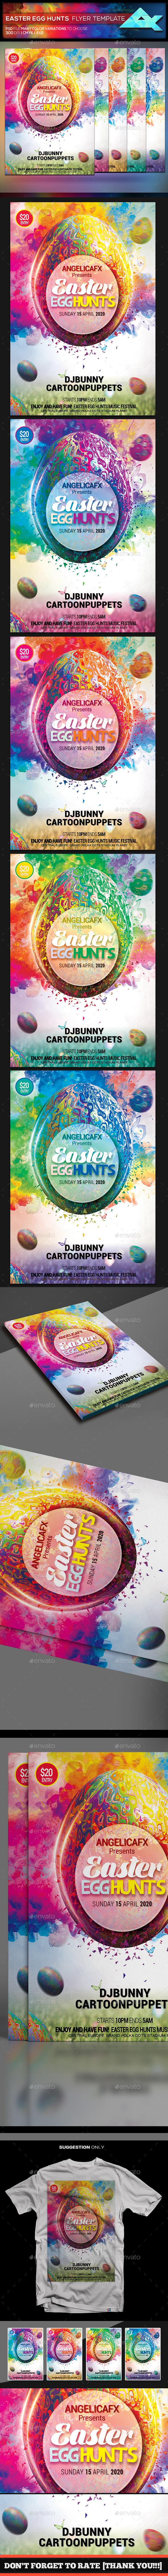 Easter Egg Hunts Festival Flyer Template - Flyers Print Templates